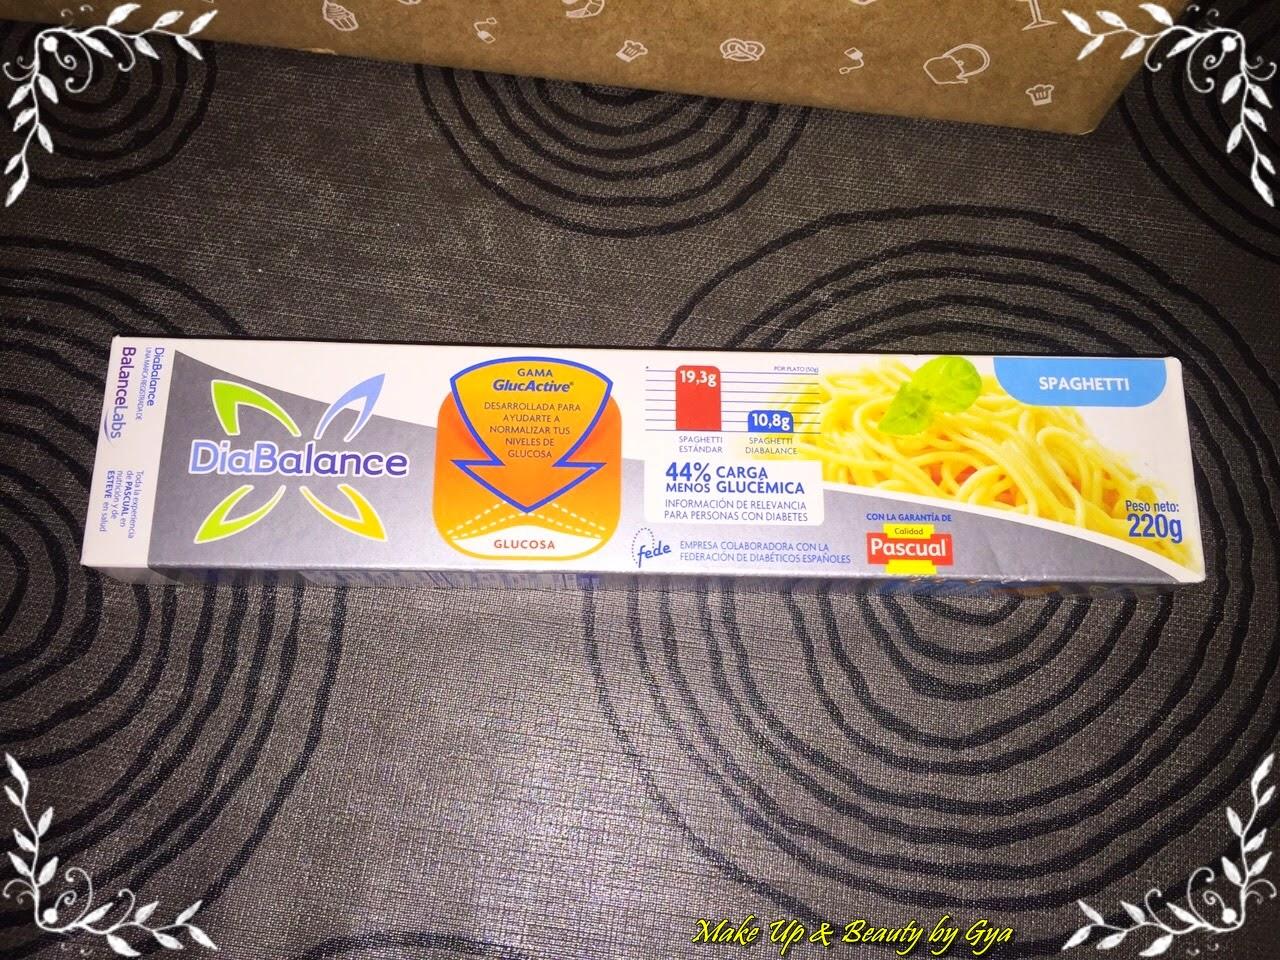 Diabalance degustabox marzo 2015